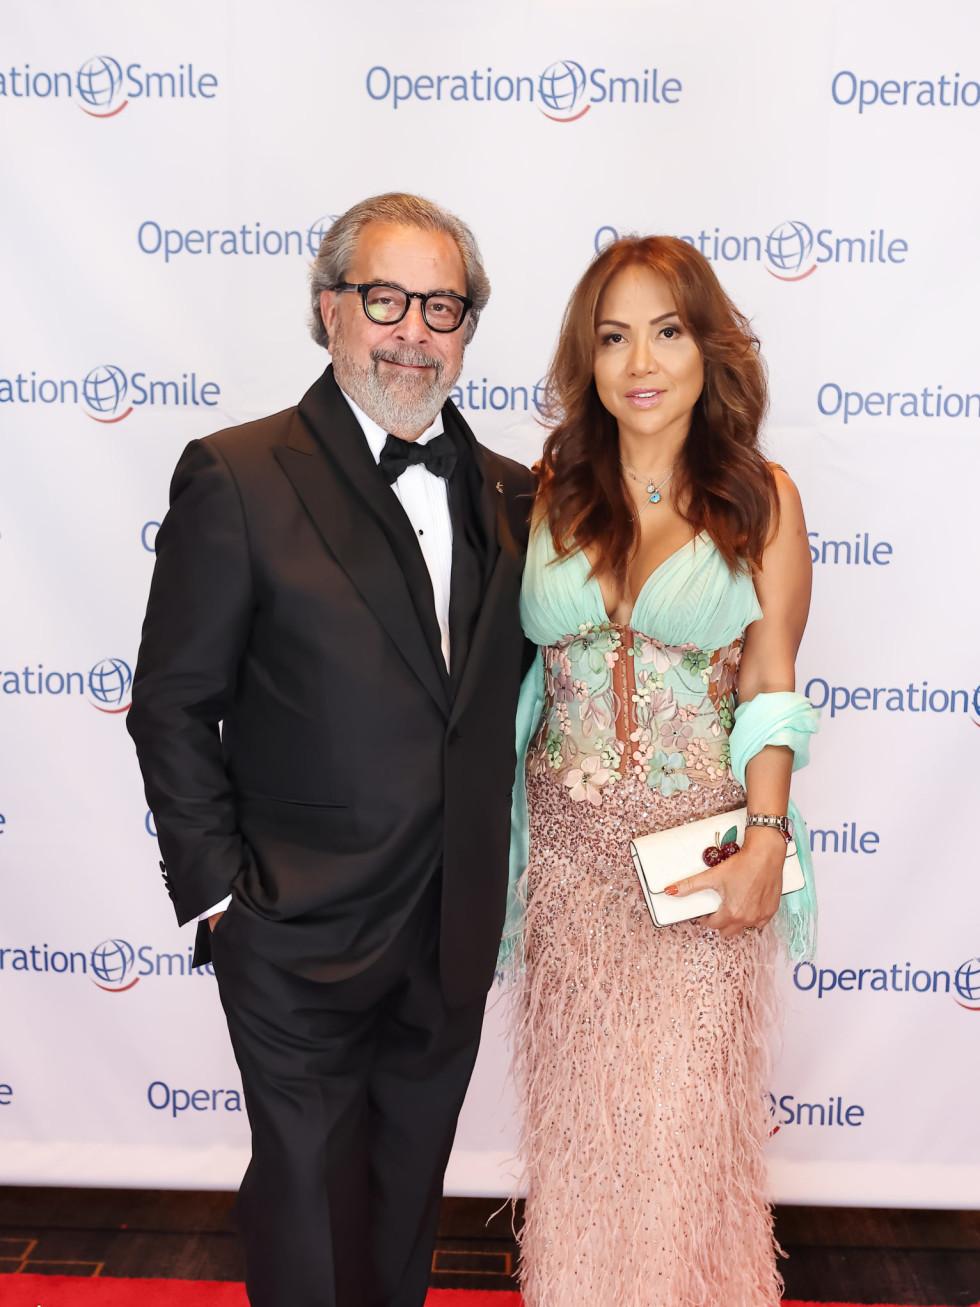 Operation Smile Gala 2021 Universal Smile Award honorees Kent Schaffer Shara Kuy